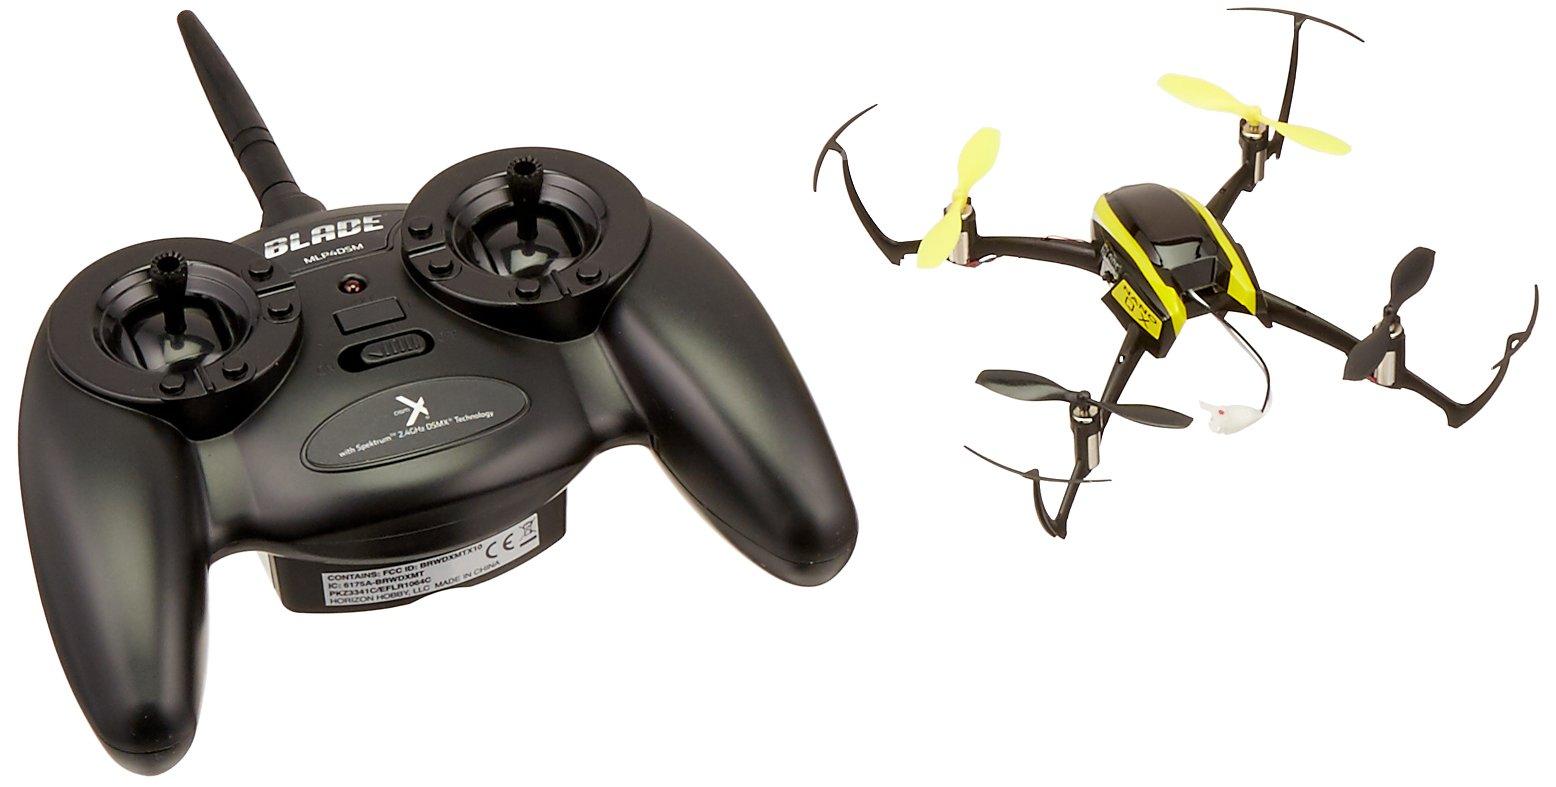 Blade Nano QX RTF Quadcopter with Safe Technology | 4-Ch DSMX Transmitter | 1S 150mAh 3.7V LiPo Battery & USB Charger